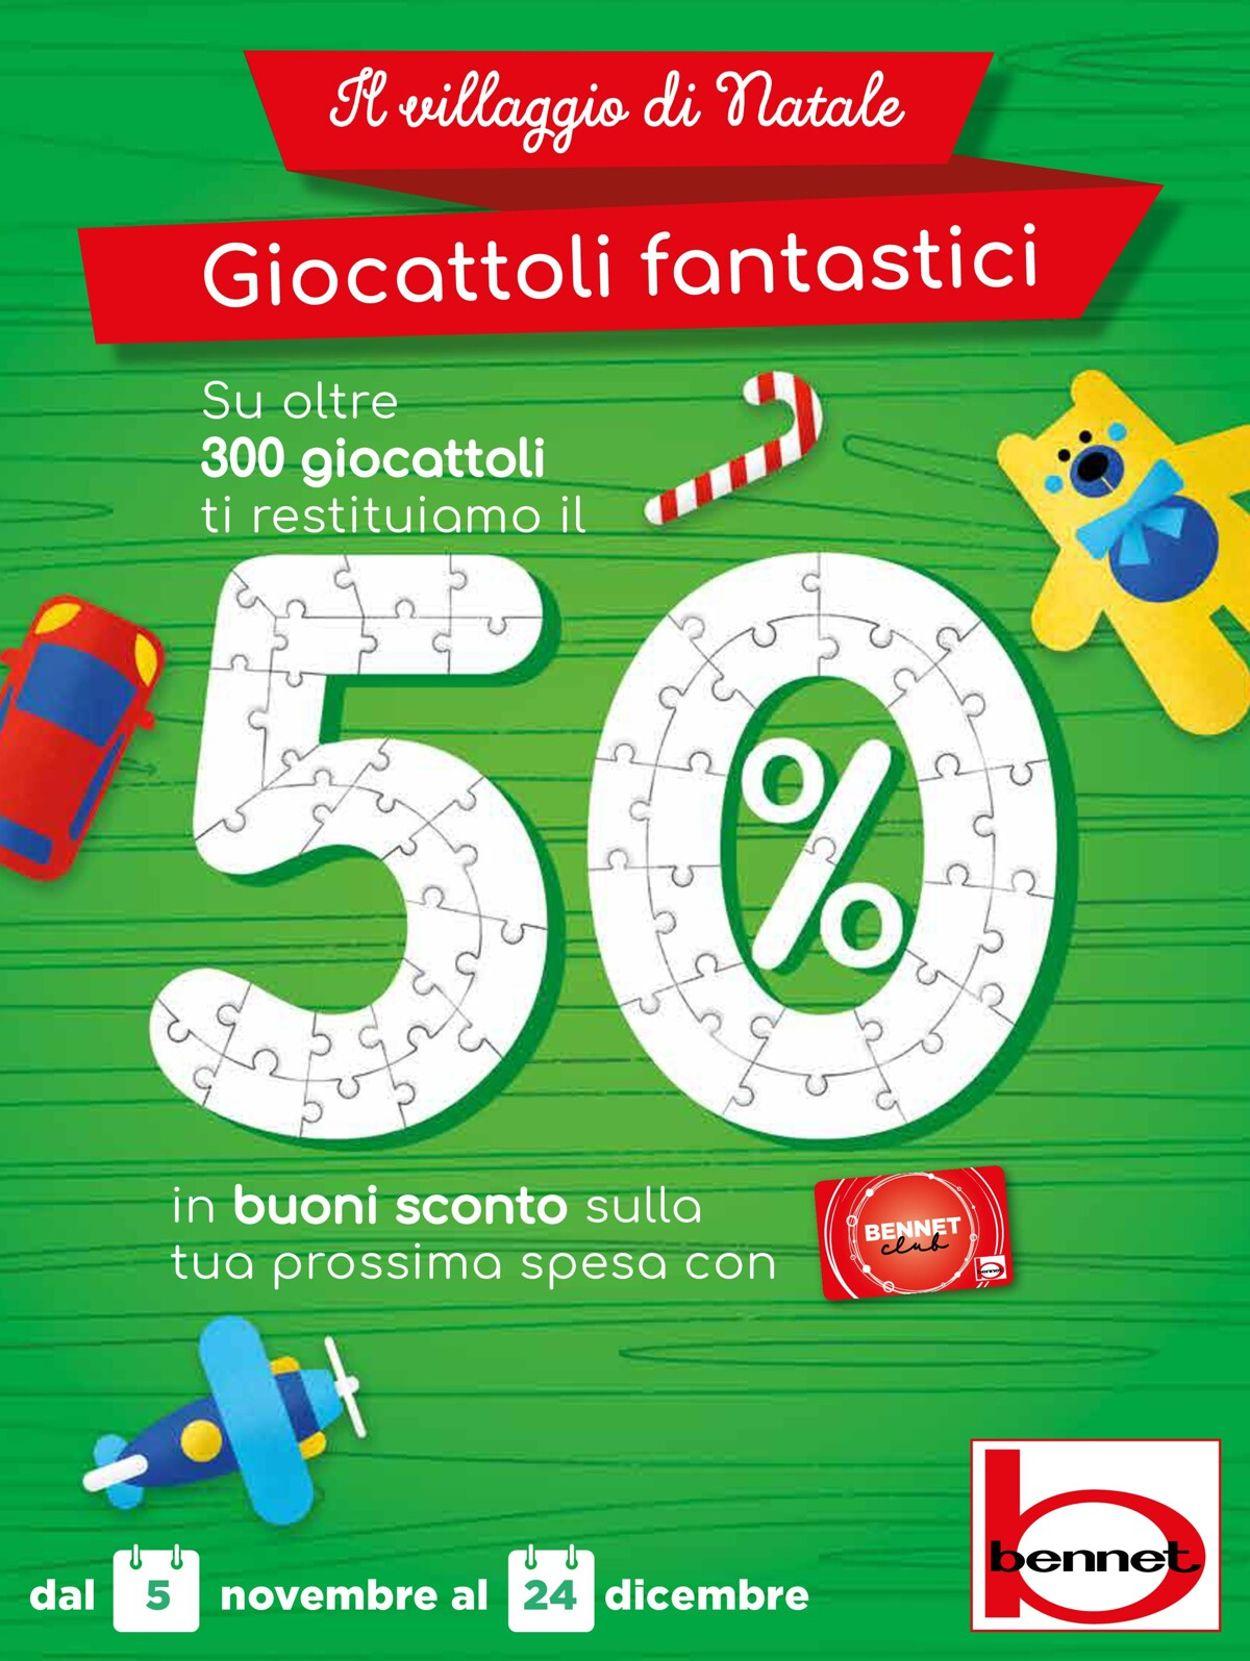 Volantino bennet - Natale 2020 - Offerte 05/11-24/12/2020